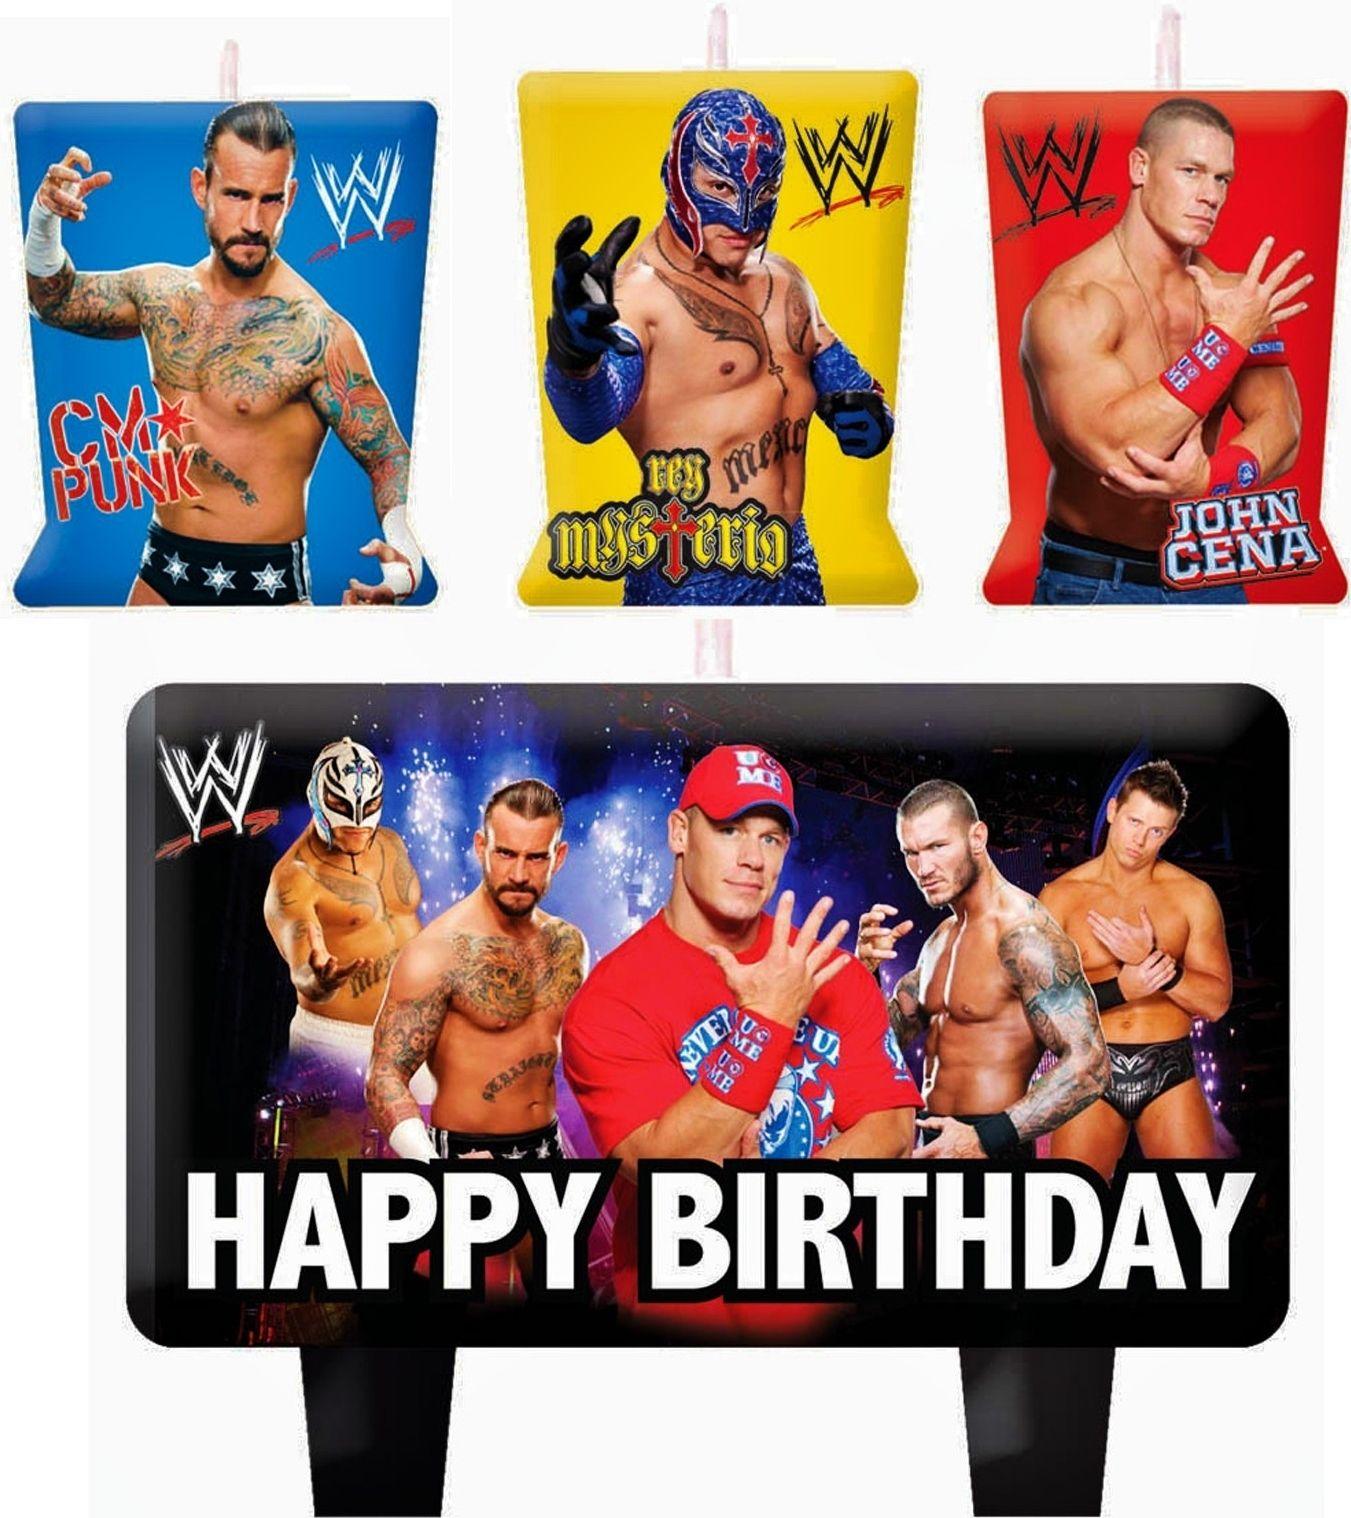 Wwe Wrestling Birthday Cake Candles Set Decoration Toppers John Cena Ebay Wrestling Birthday Wwe Birthday Party Wwe Birthday